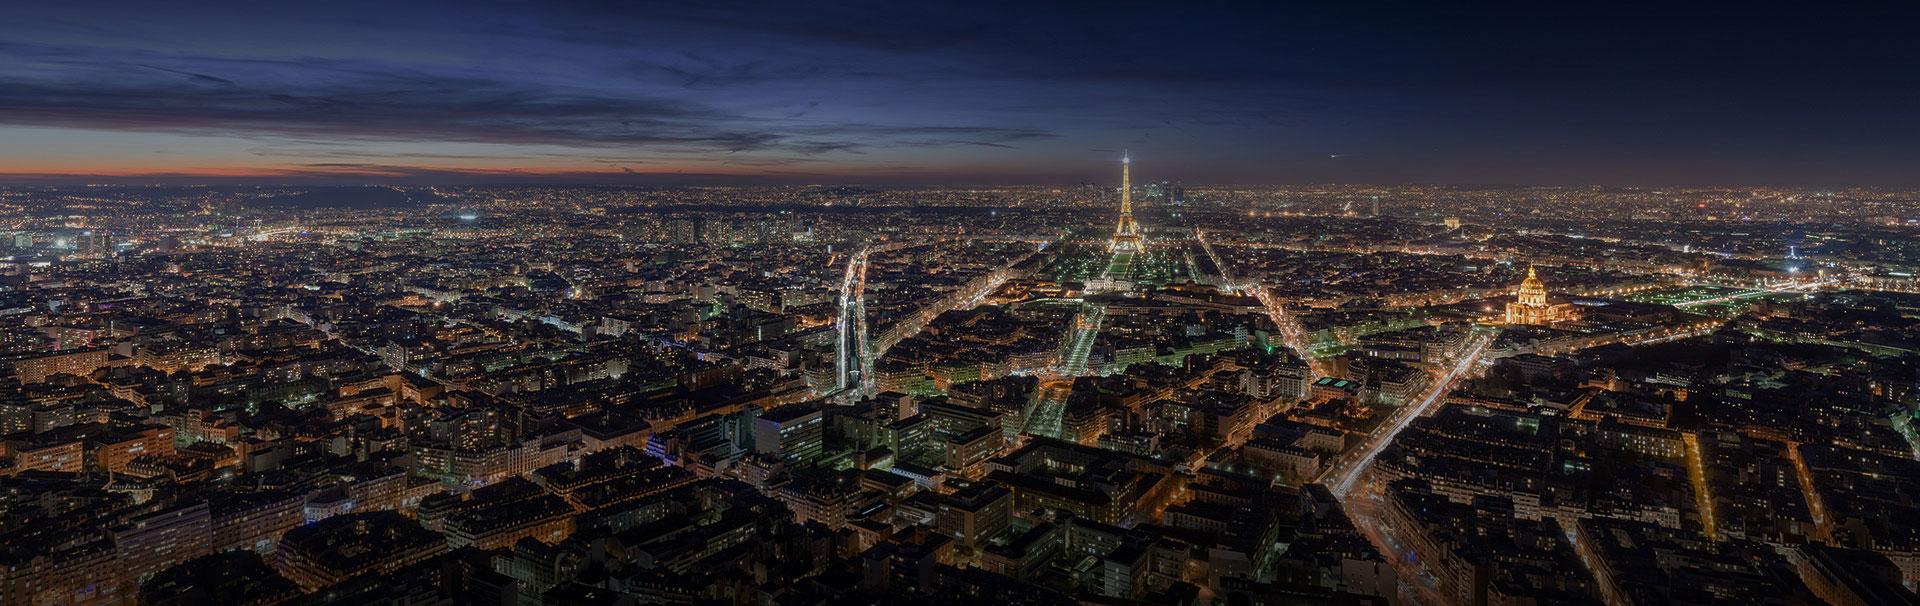 www.videolan.org/images/events/vdd18/paris-night.jpg